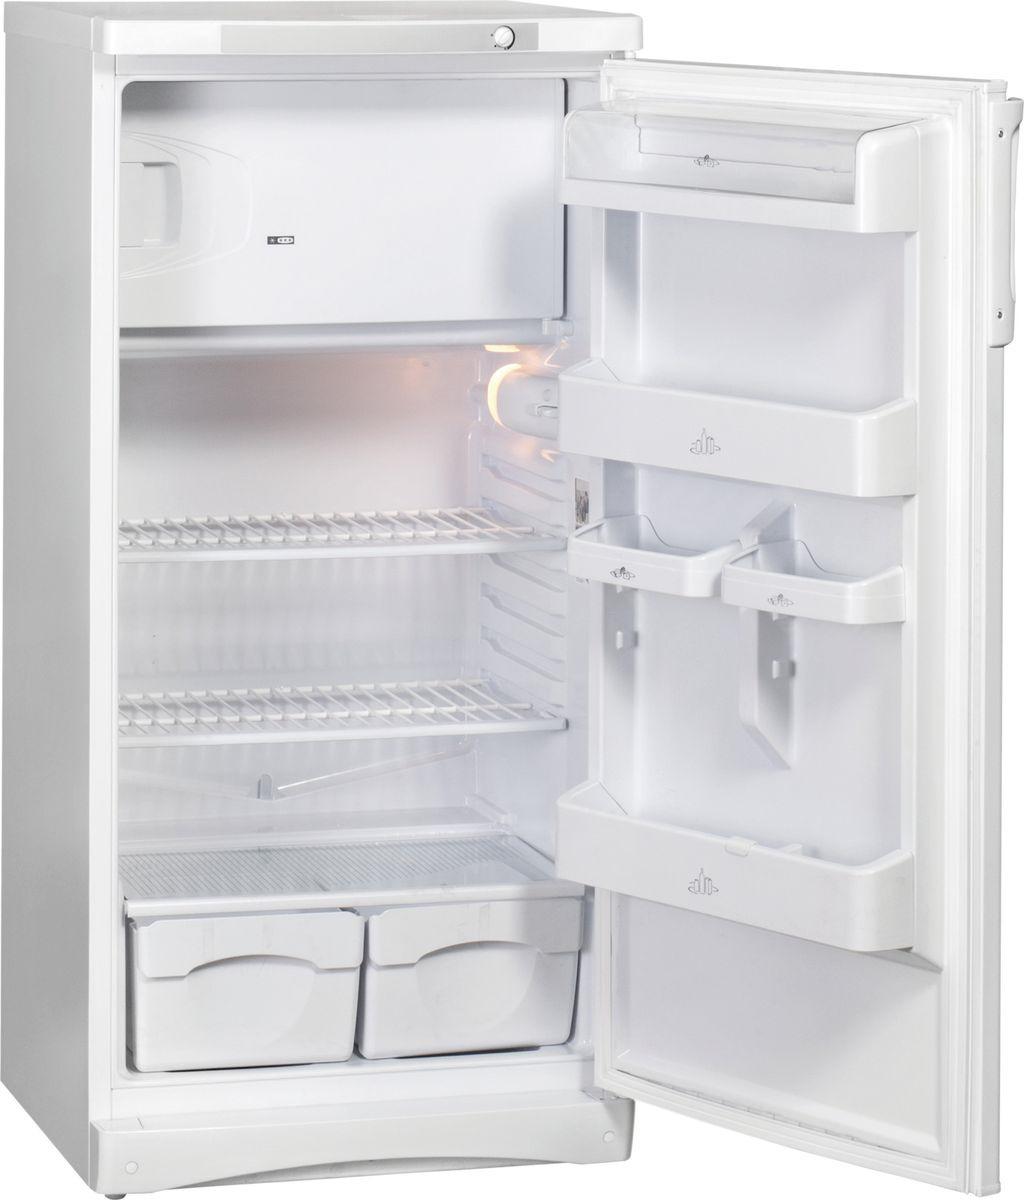 Холодильник Stinol STD 125, белый Stinol